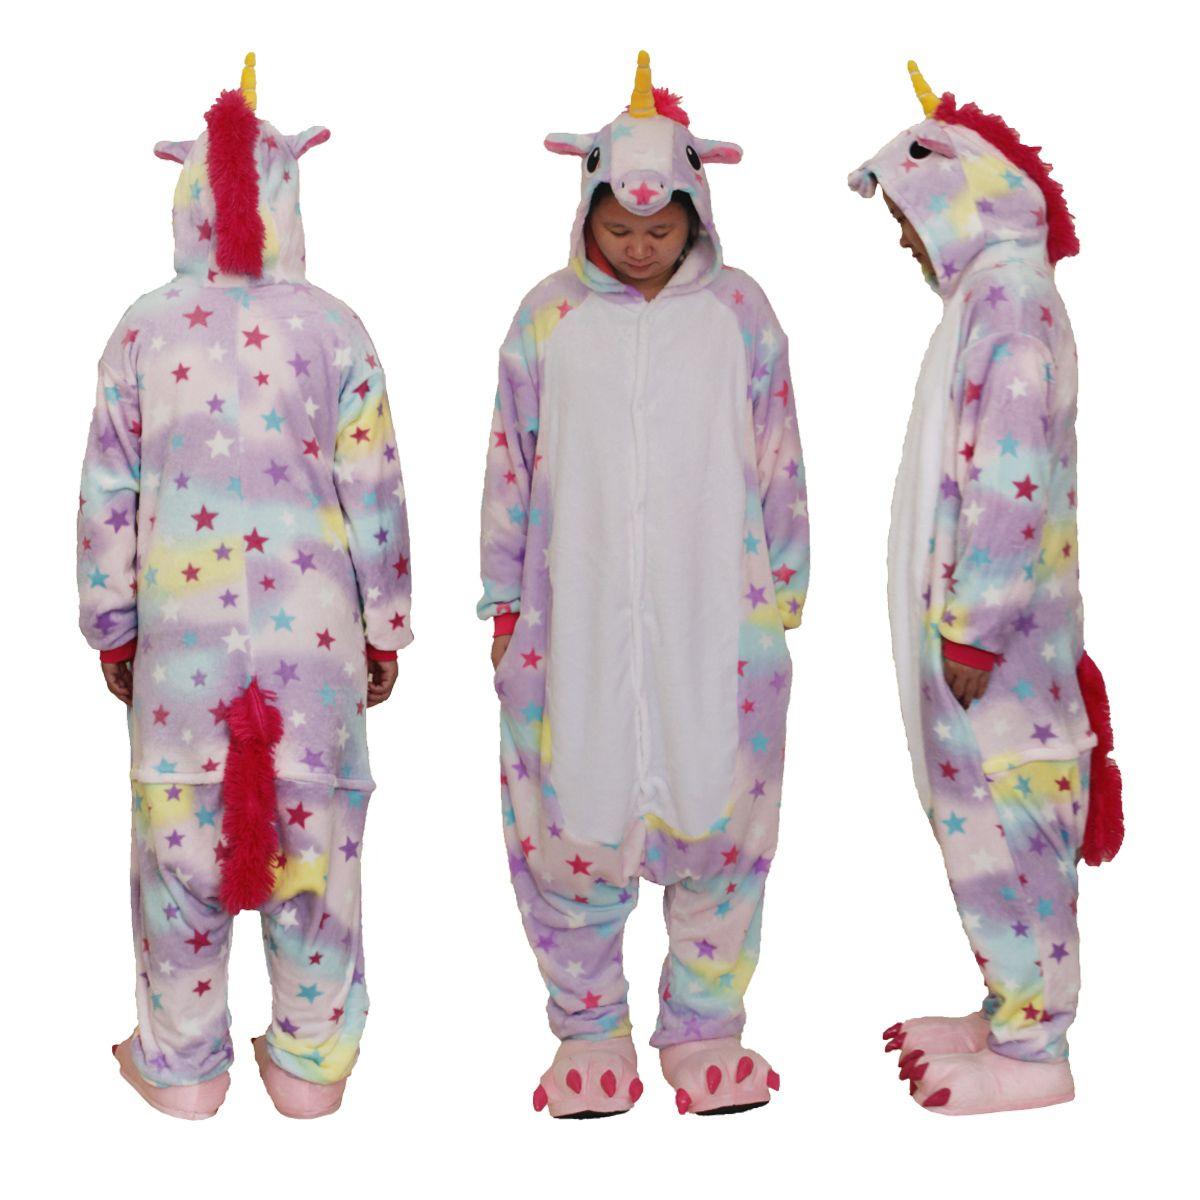 Acheter Adulte Animal Pyjamas Cosplay Costume Unisexe One Piece Pyjama Kigurumi  Licorne De  22.33 Du Dhwiner   DHgate.Com a062abfd499d